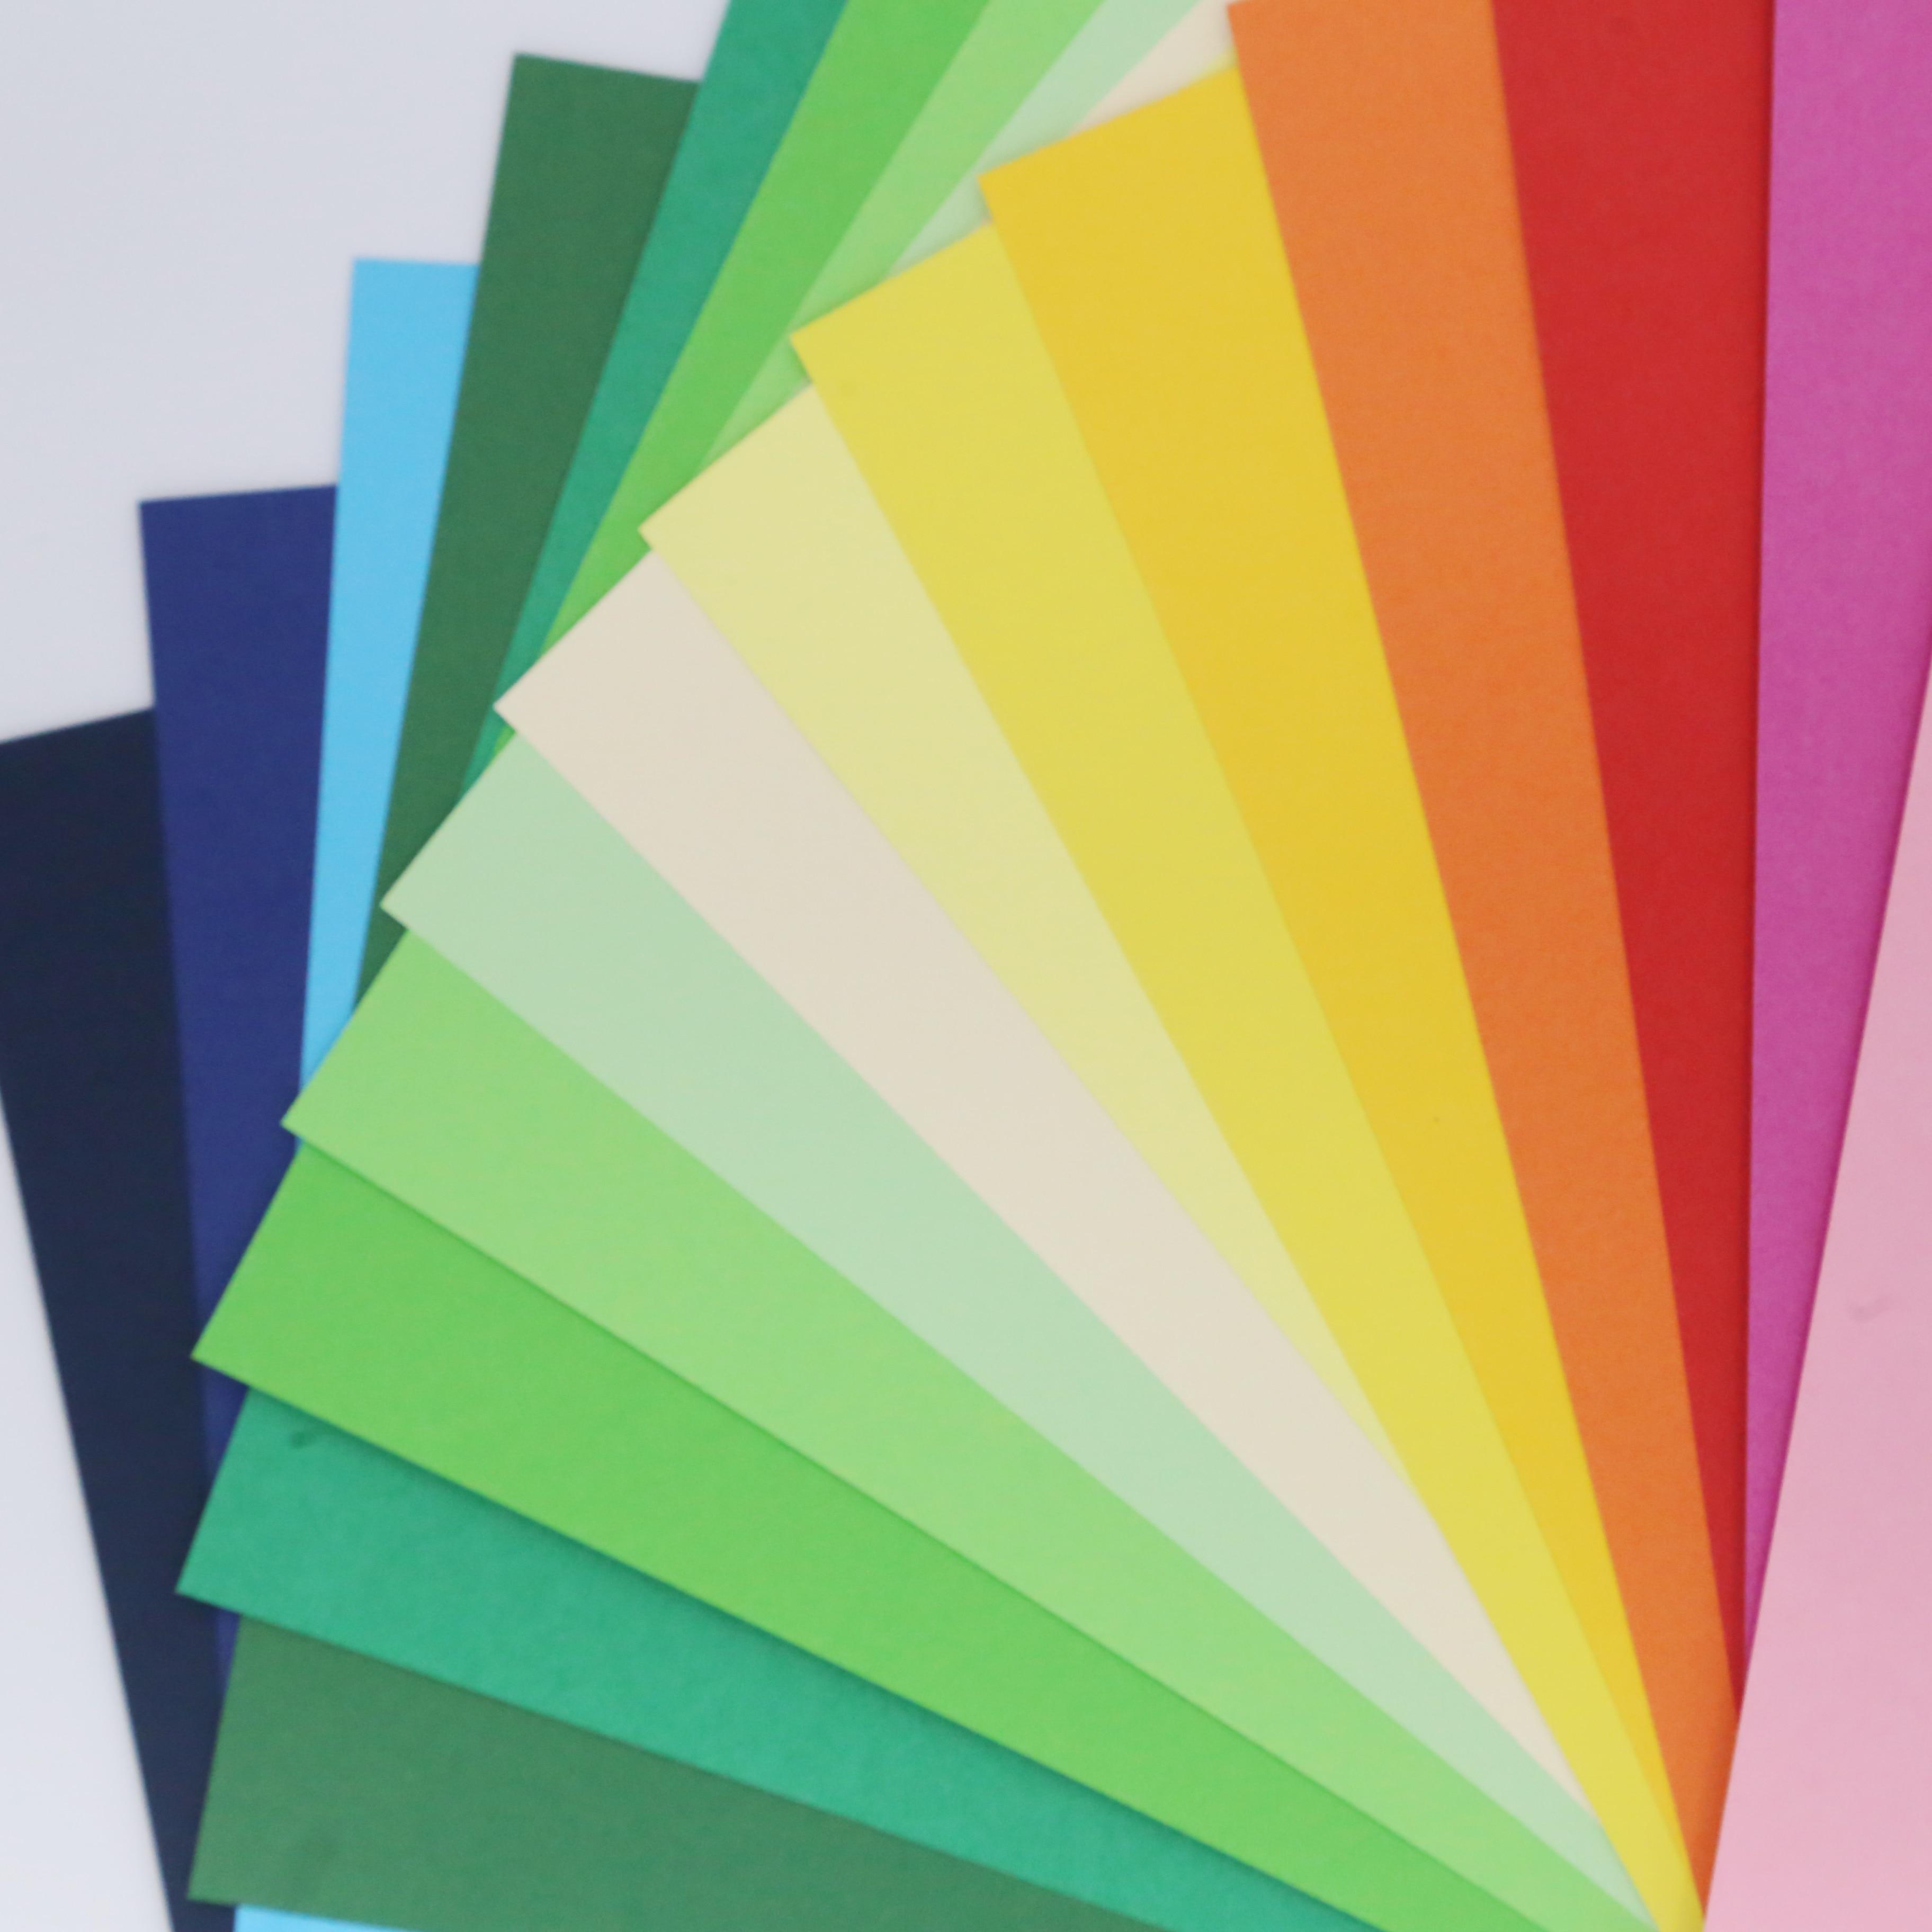 50uds Cartulina para manualidades papel grueso hoja de papel colores A4 180g